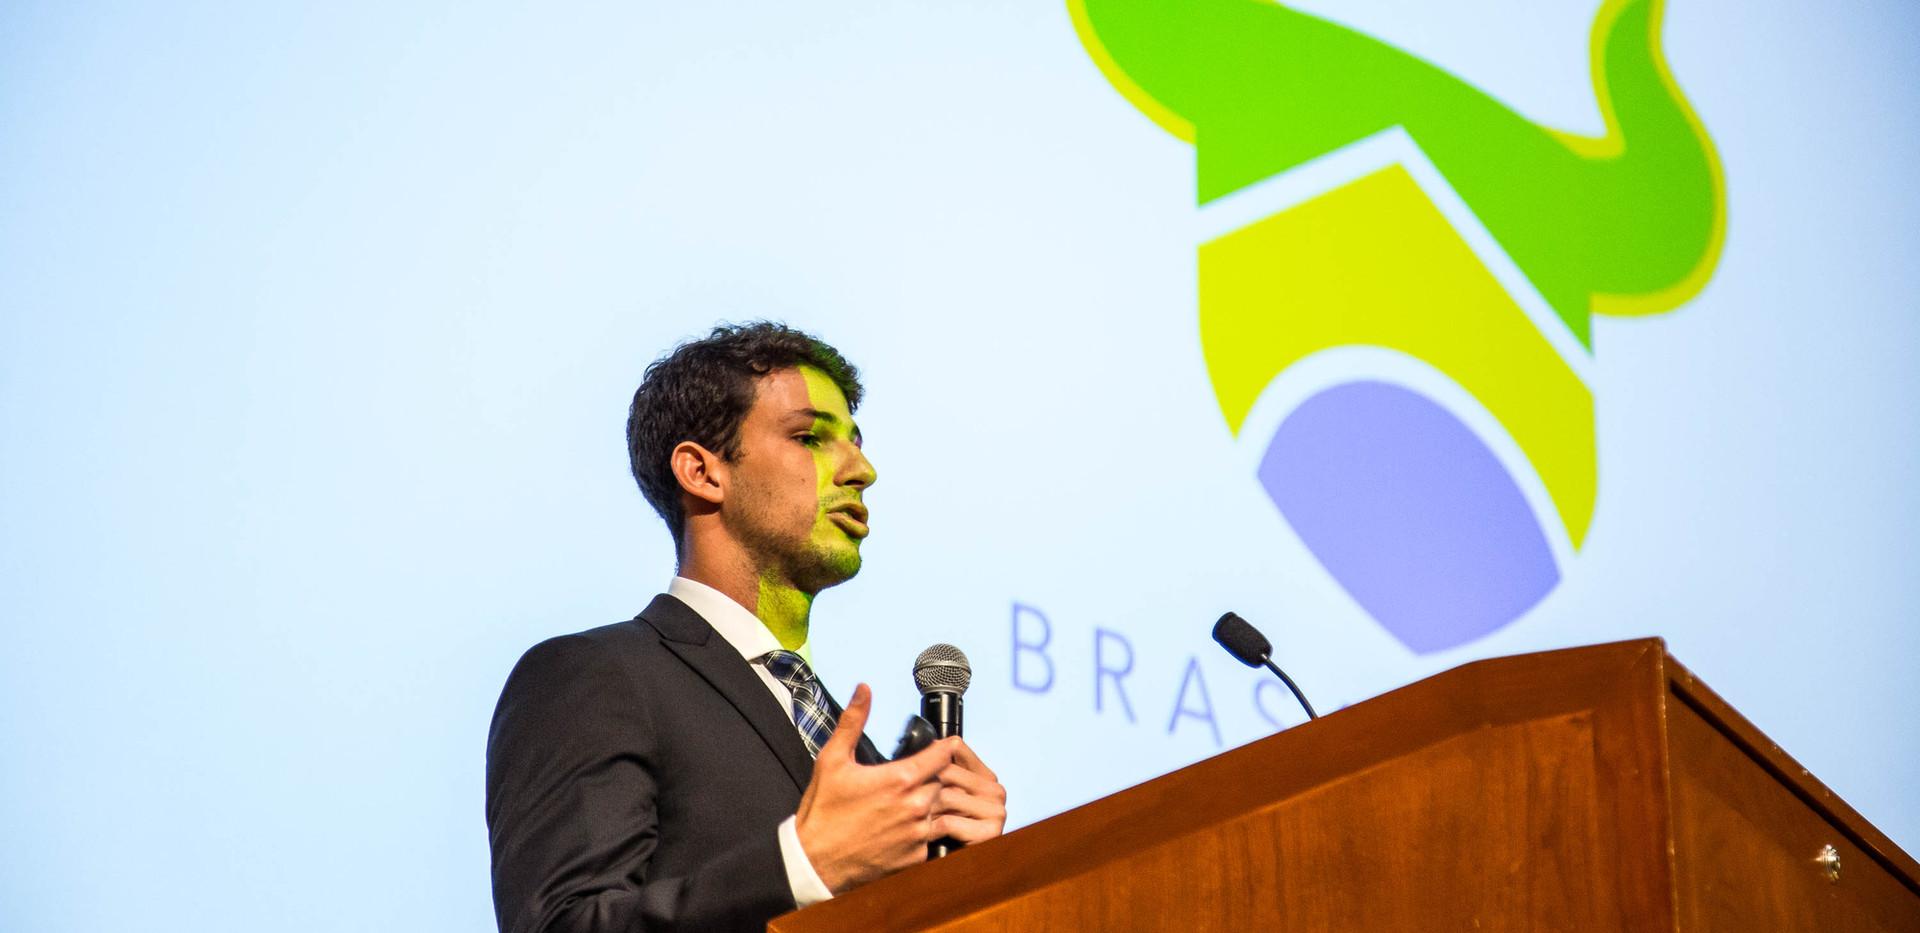 Brazil-FloridaStudentConference-16.jpg